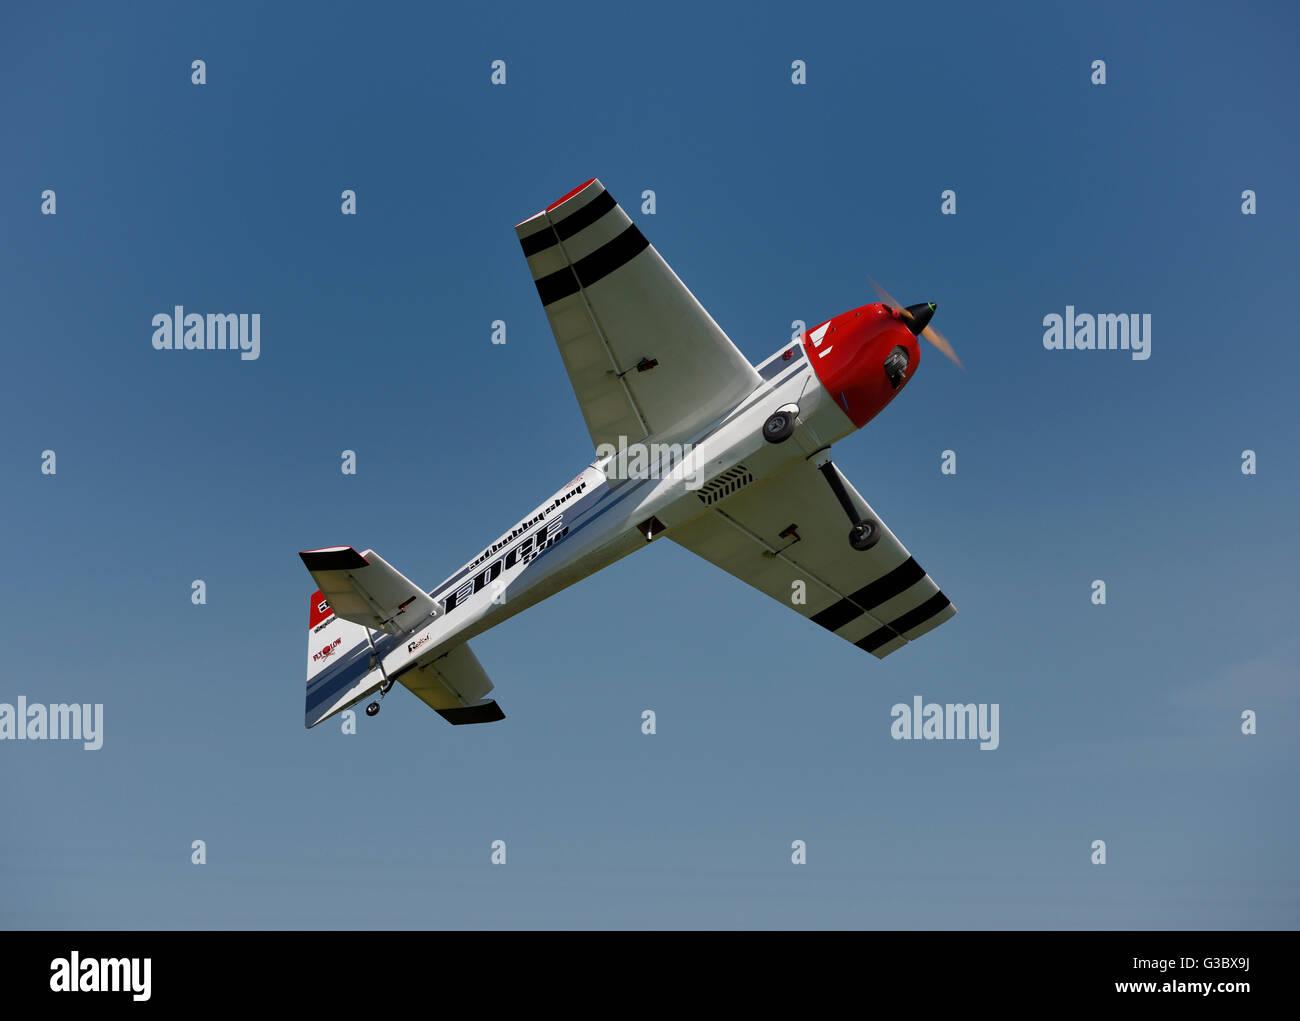 Single prop radio controlled airplane flying overhead - Stock Image